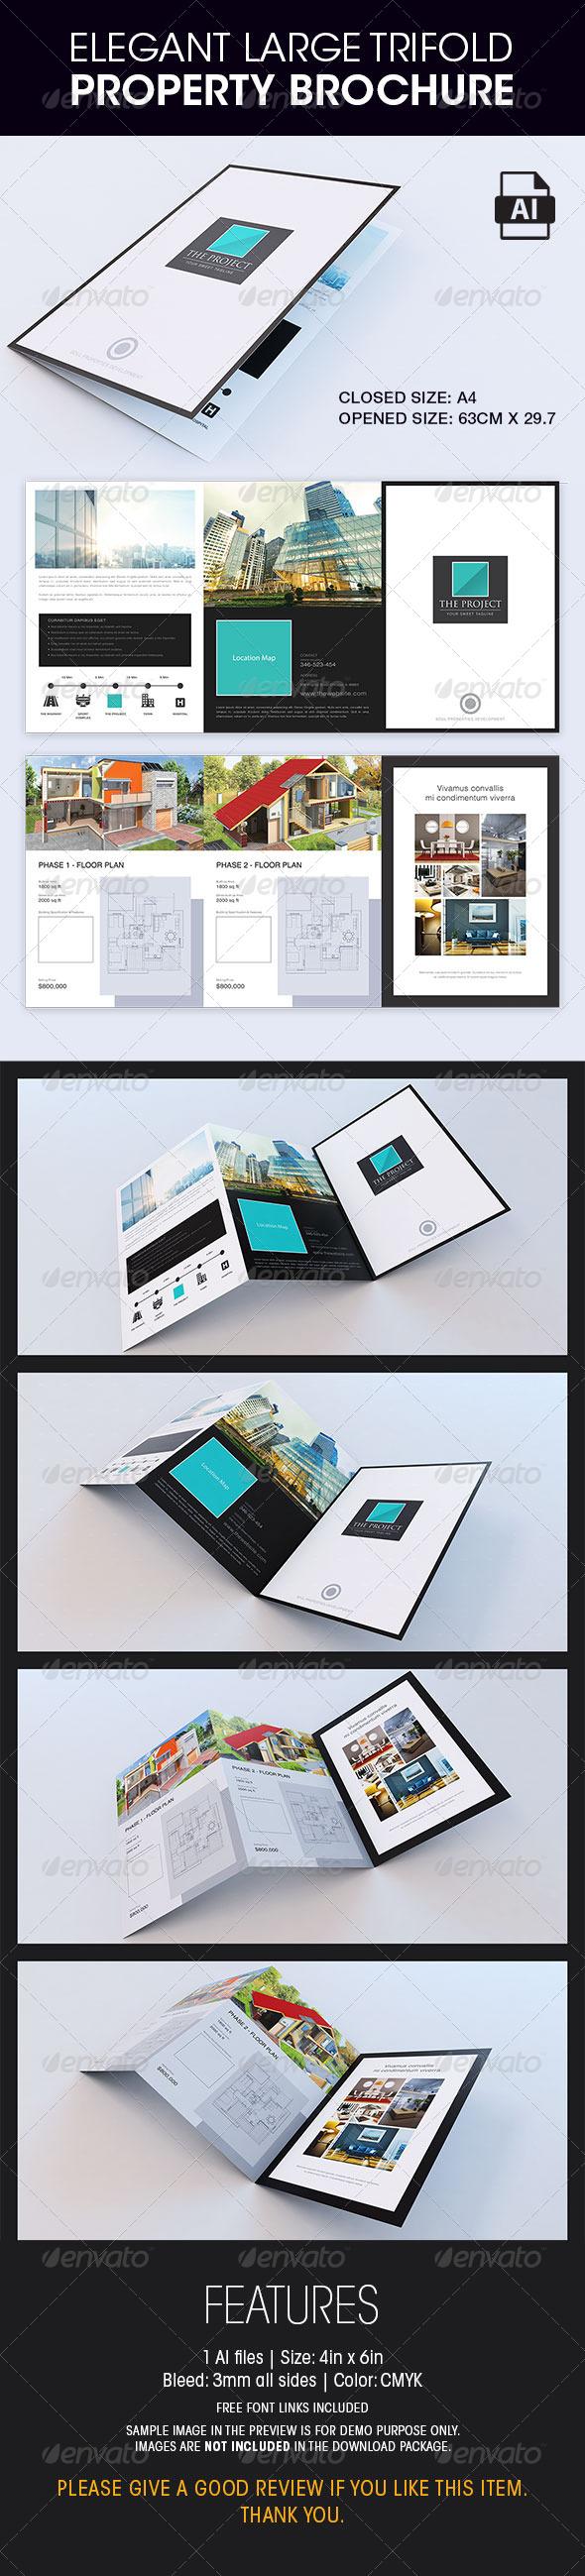 GraphicRiver Elegant Large Trifold Property Brochure 8782027